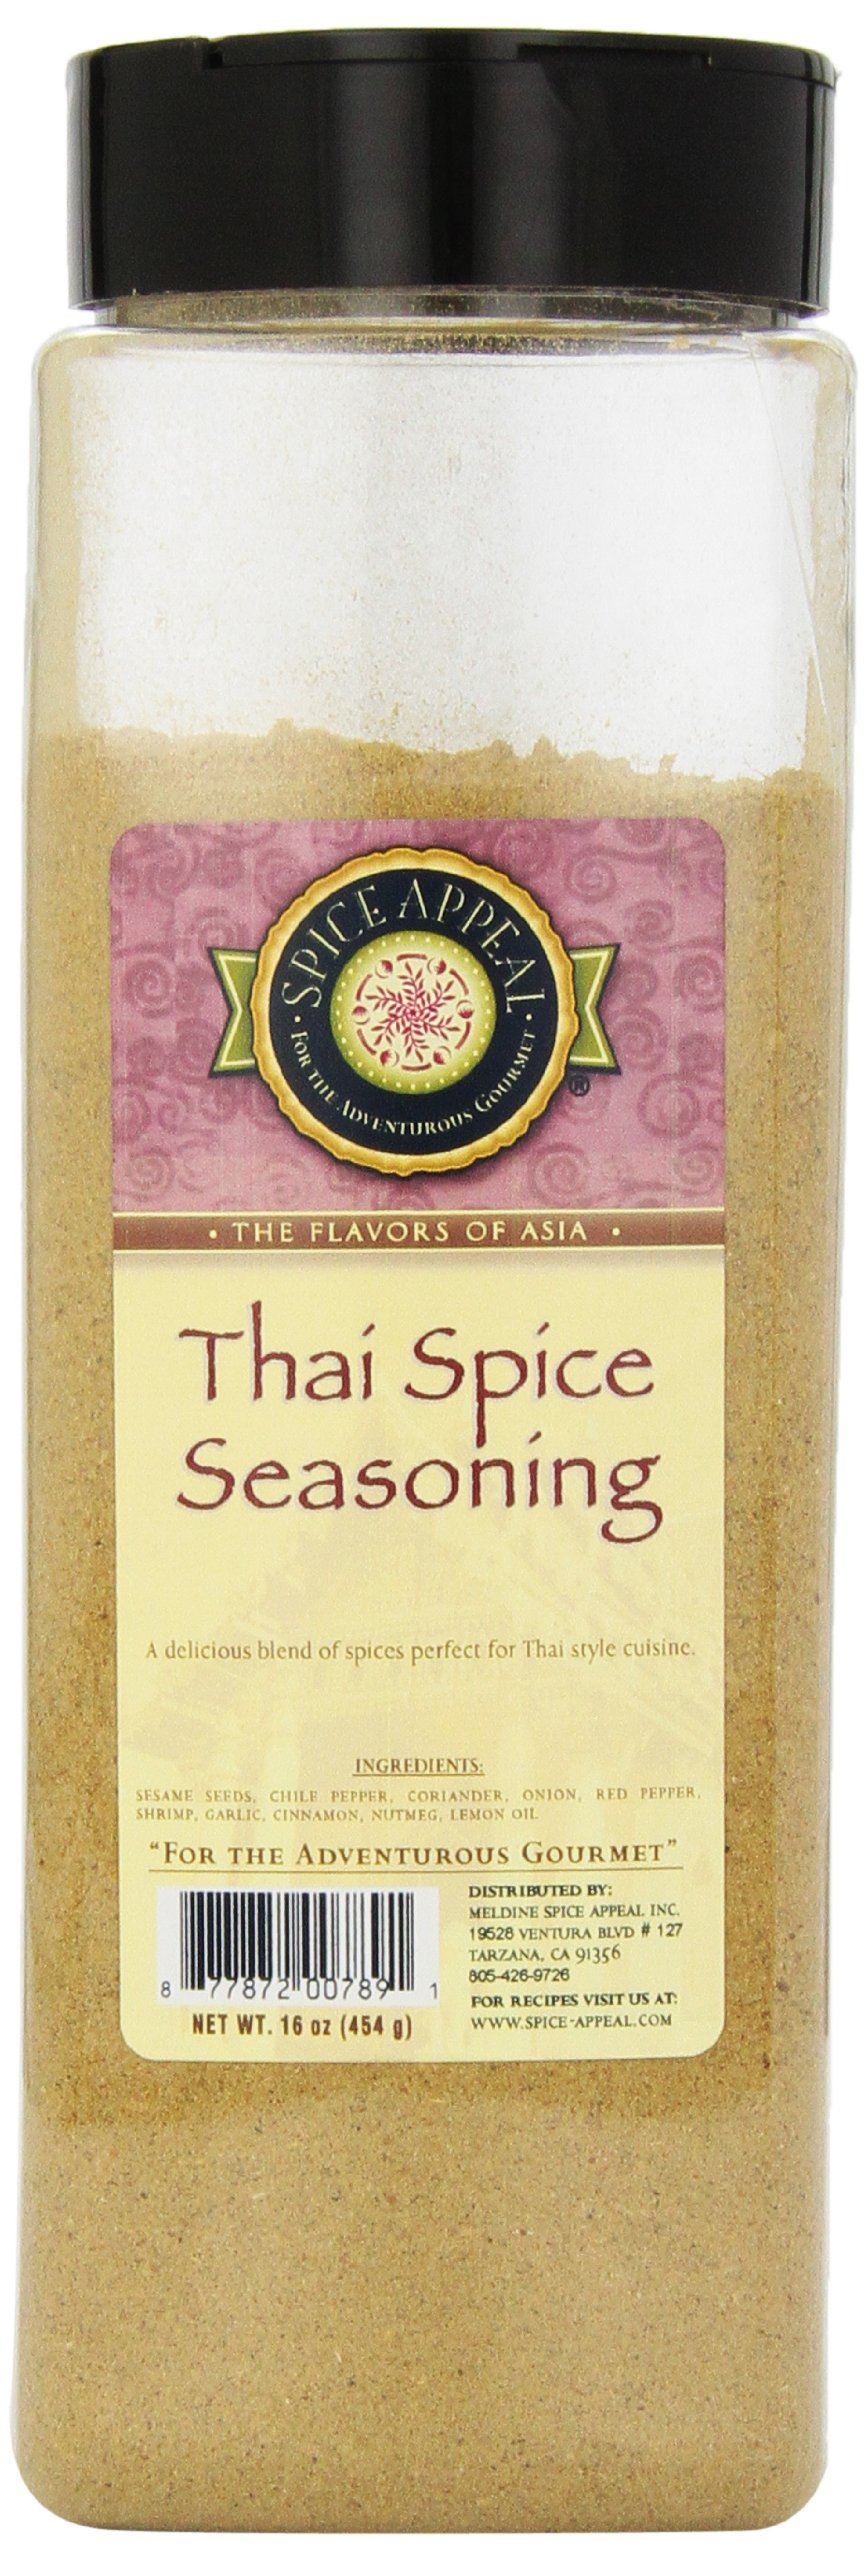 Spice Appeal Thai Spice Seasoning, 16 Ounce